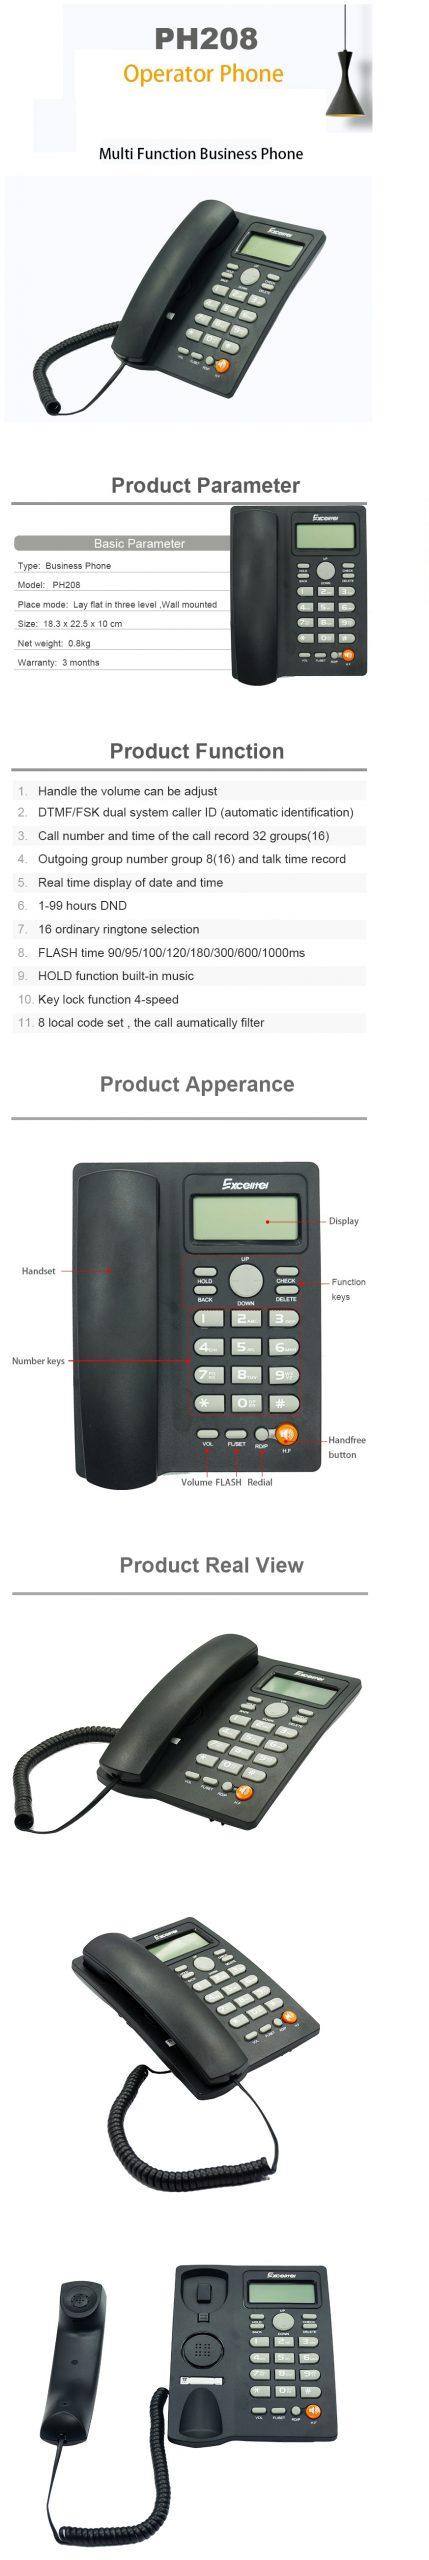 Excelltel Telephone set Callar-ID